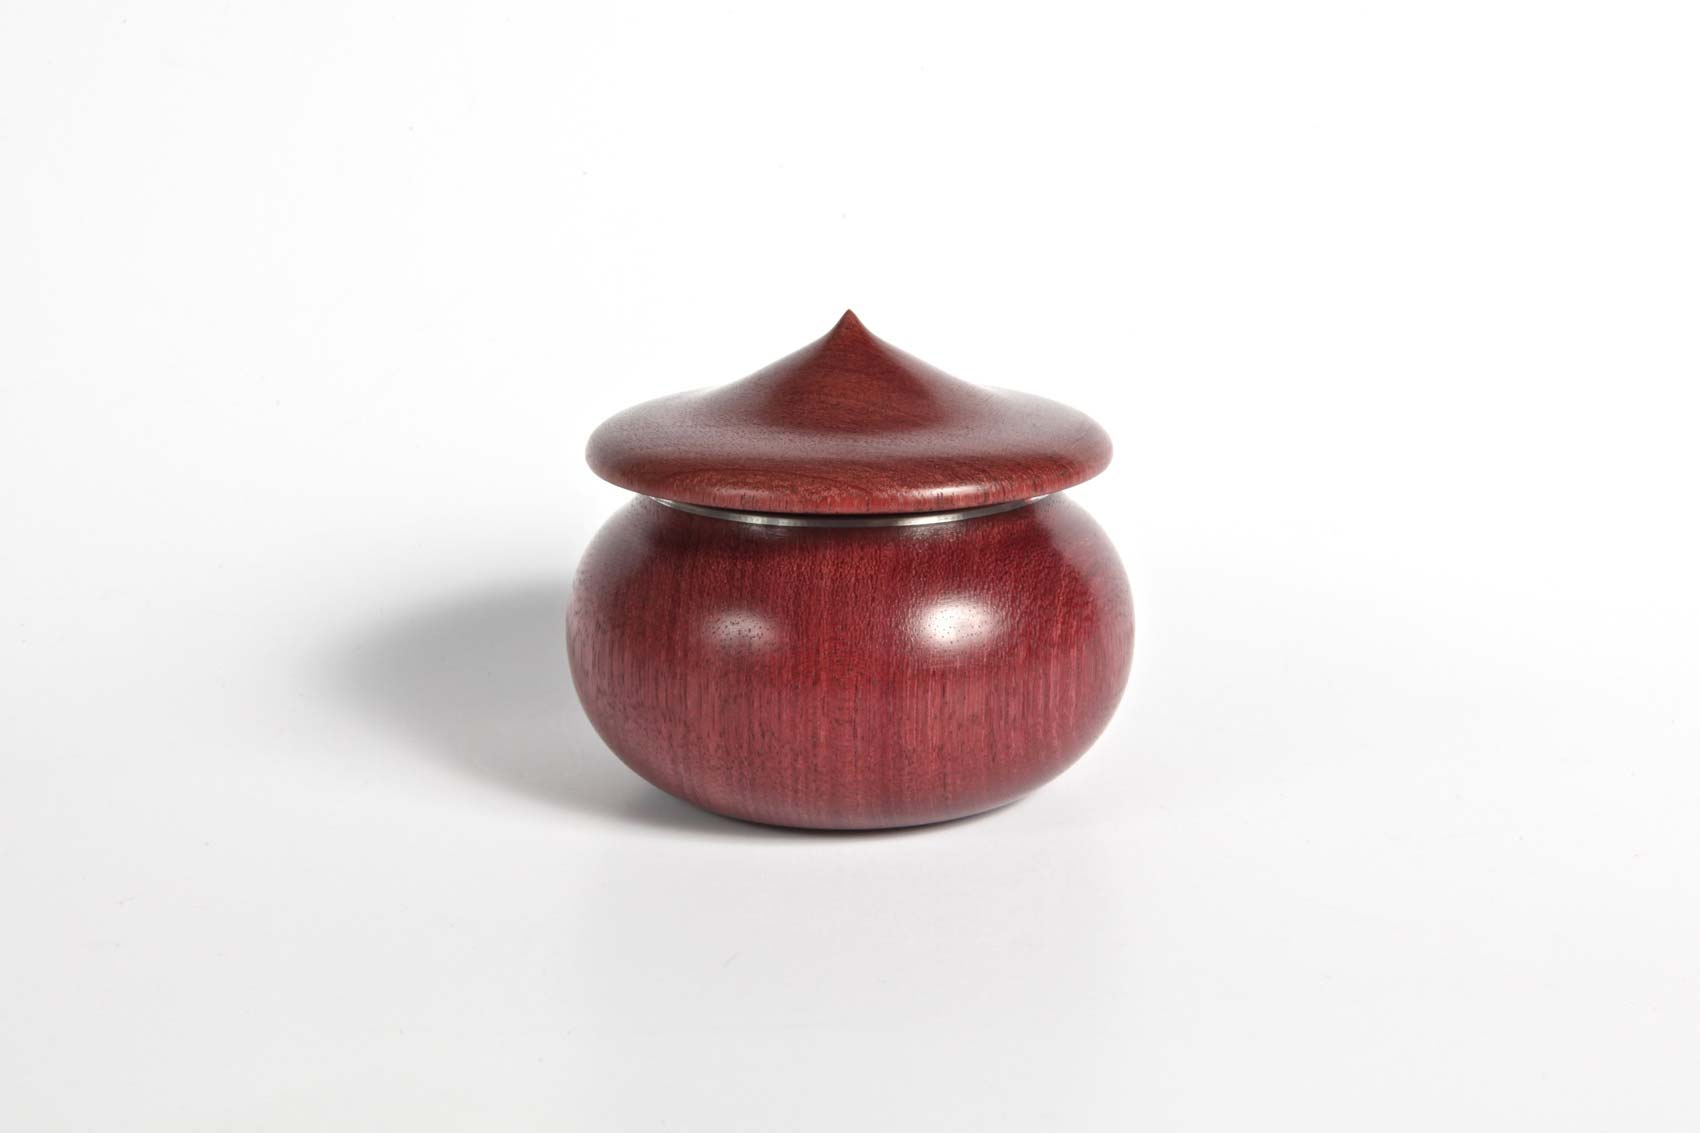 purple-heart-lidded-pot-with-pewter-rim